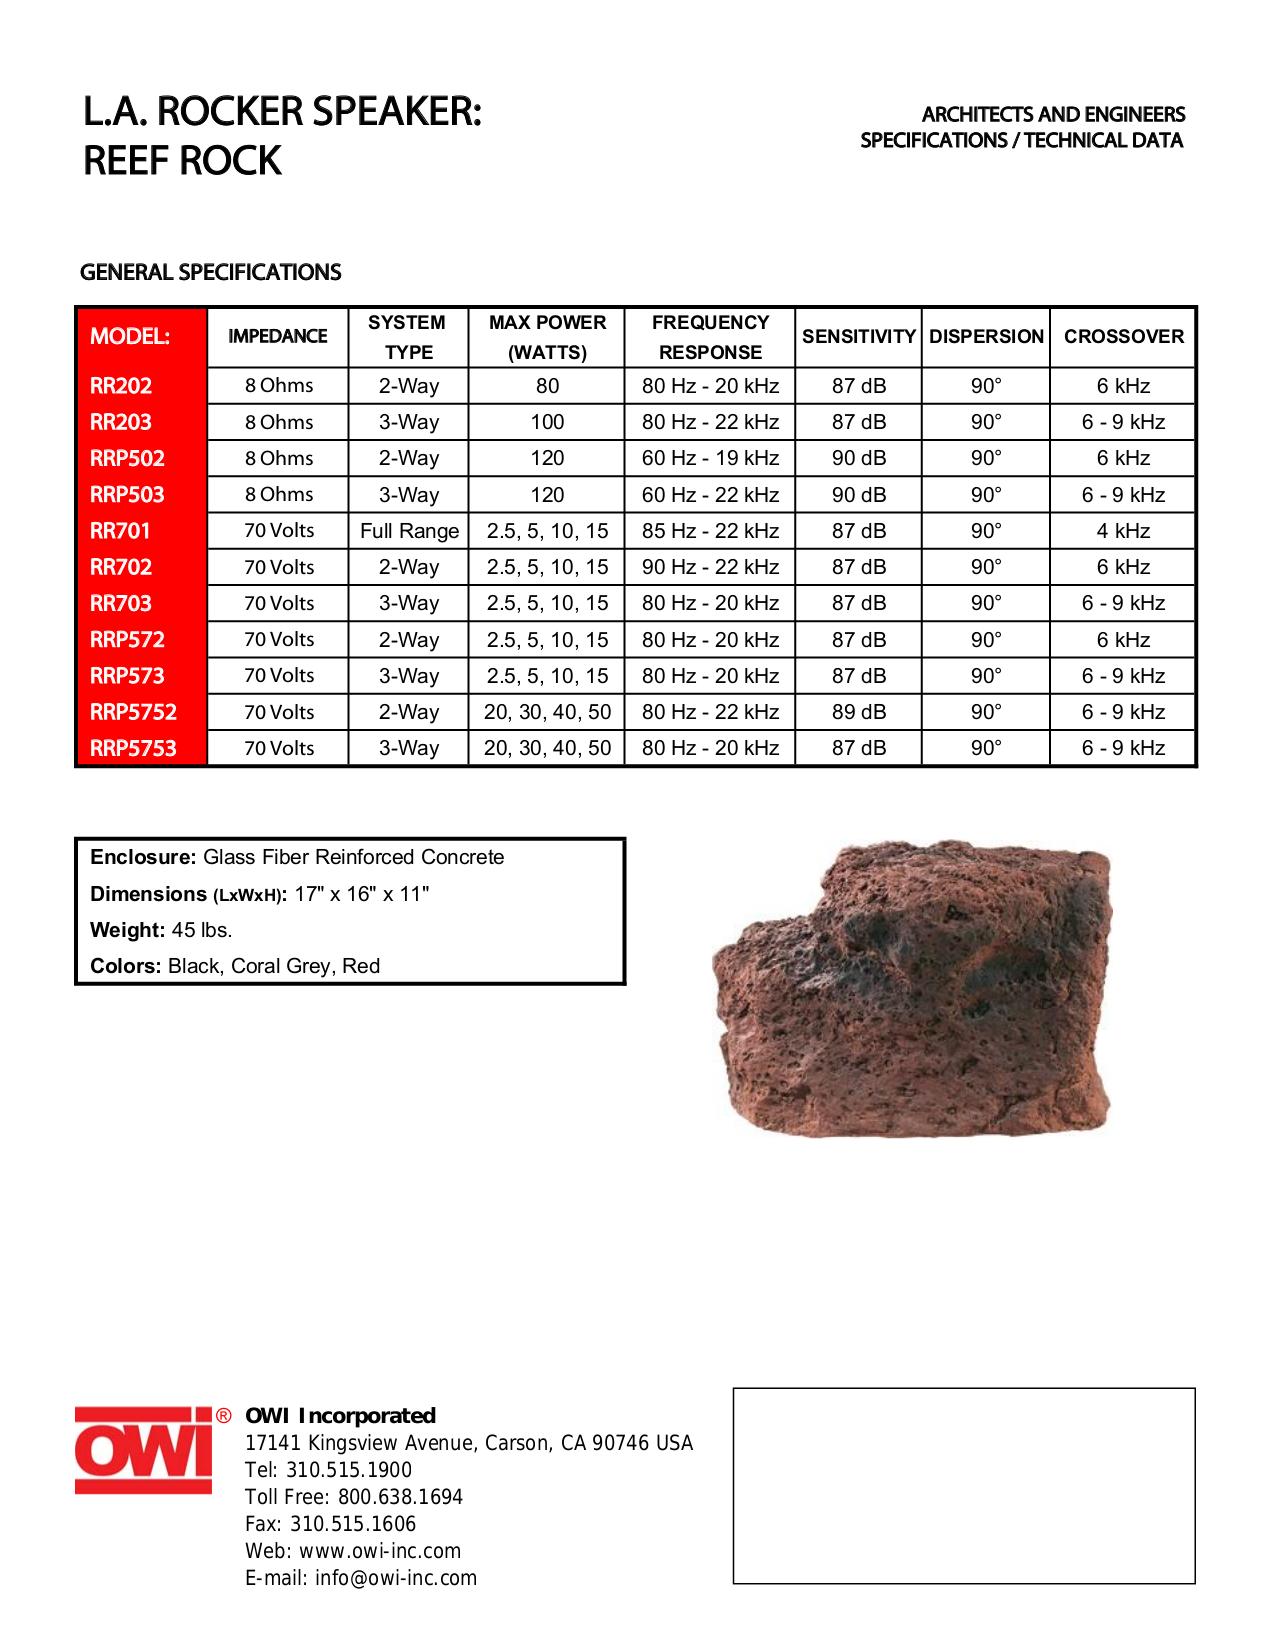 pdf for Owi Speaker RR202 manual